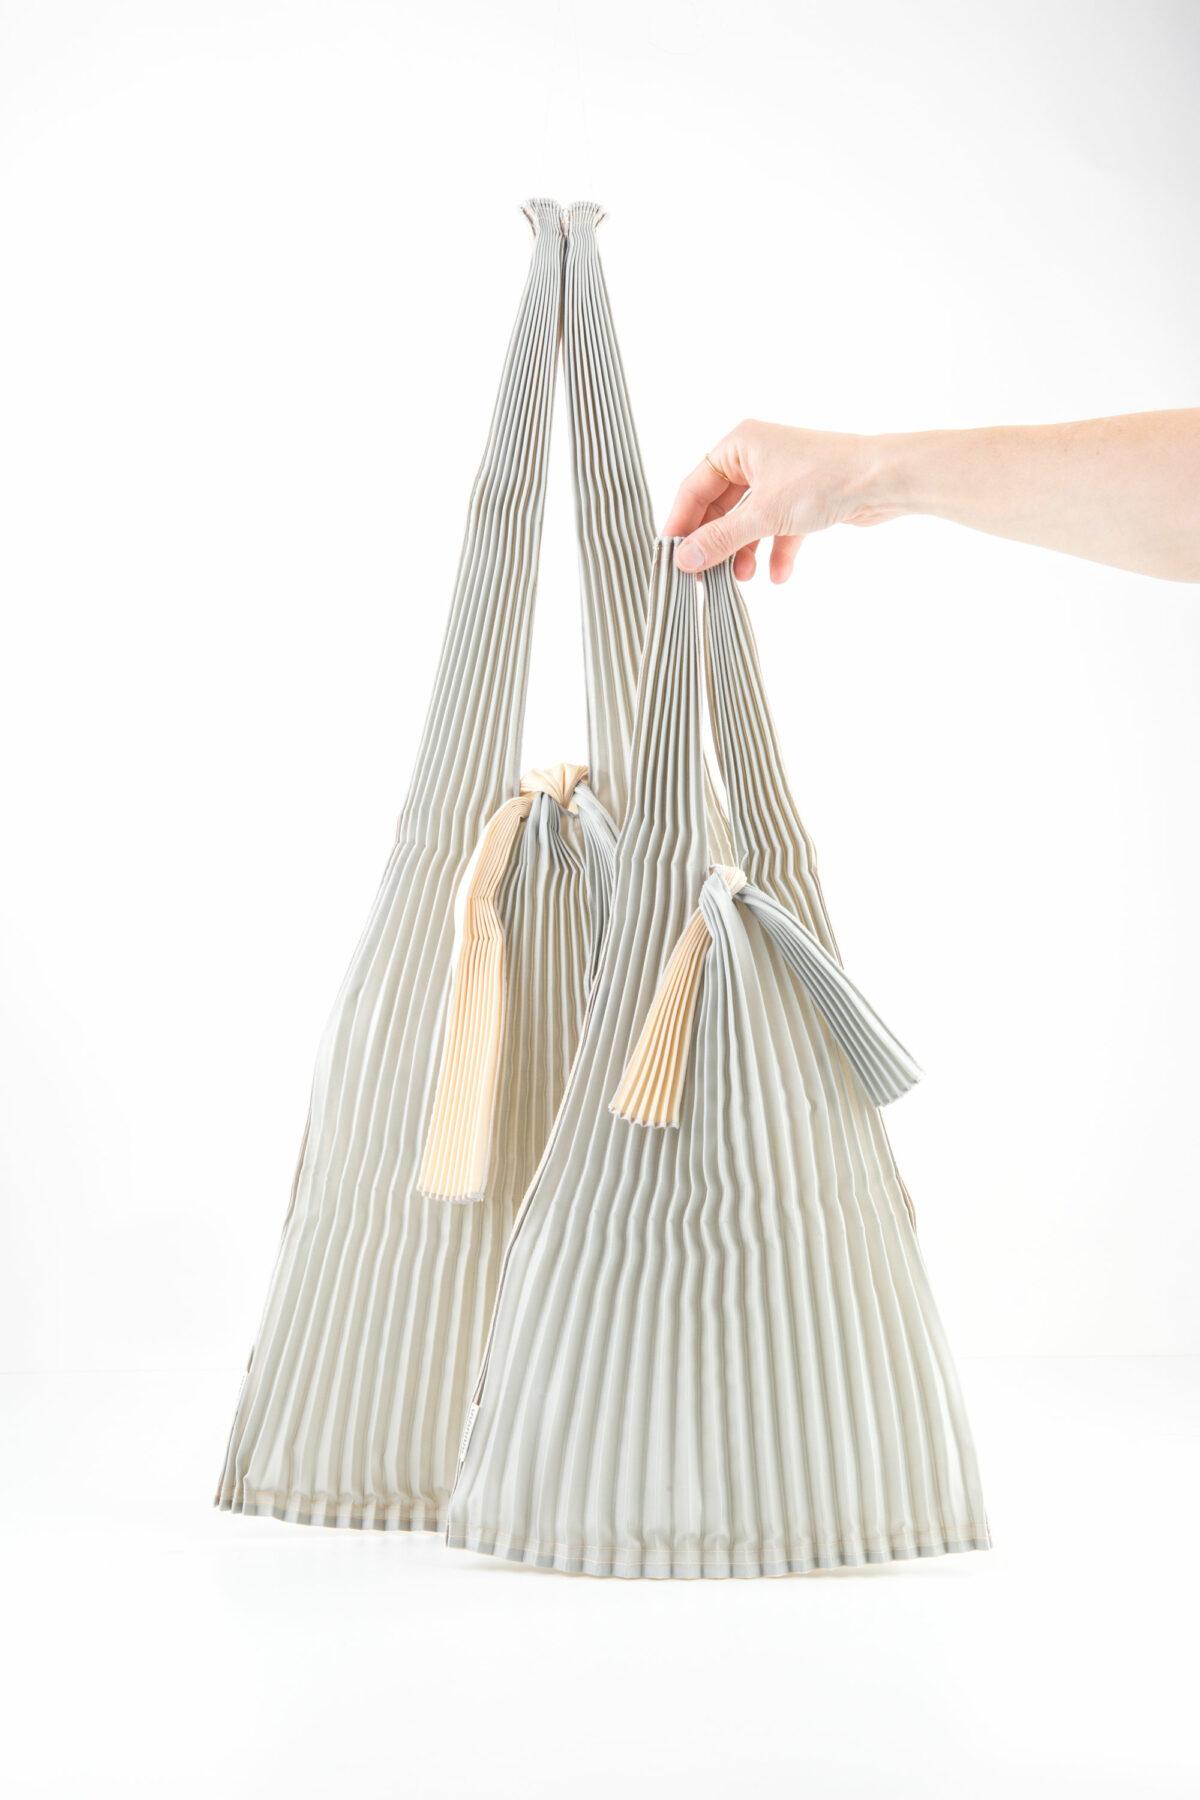 tote-eco-tate-bag-pleated-pleco-matchbox